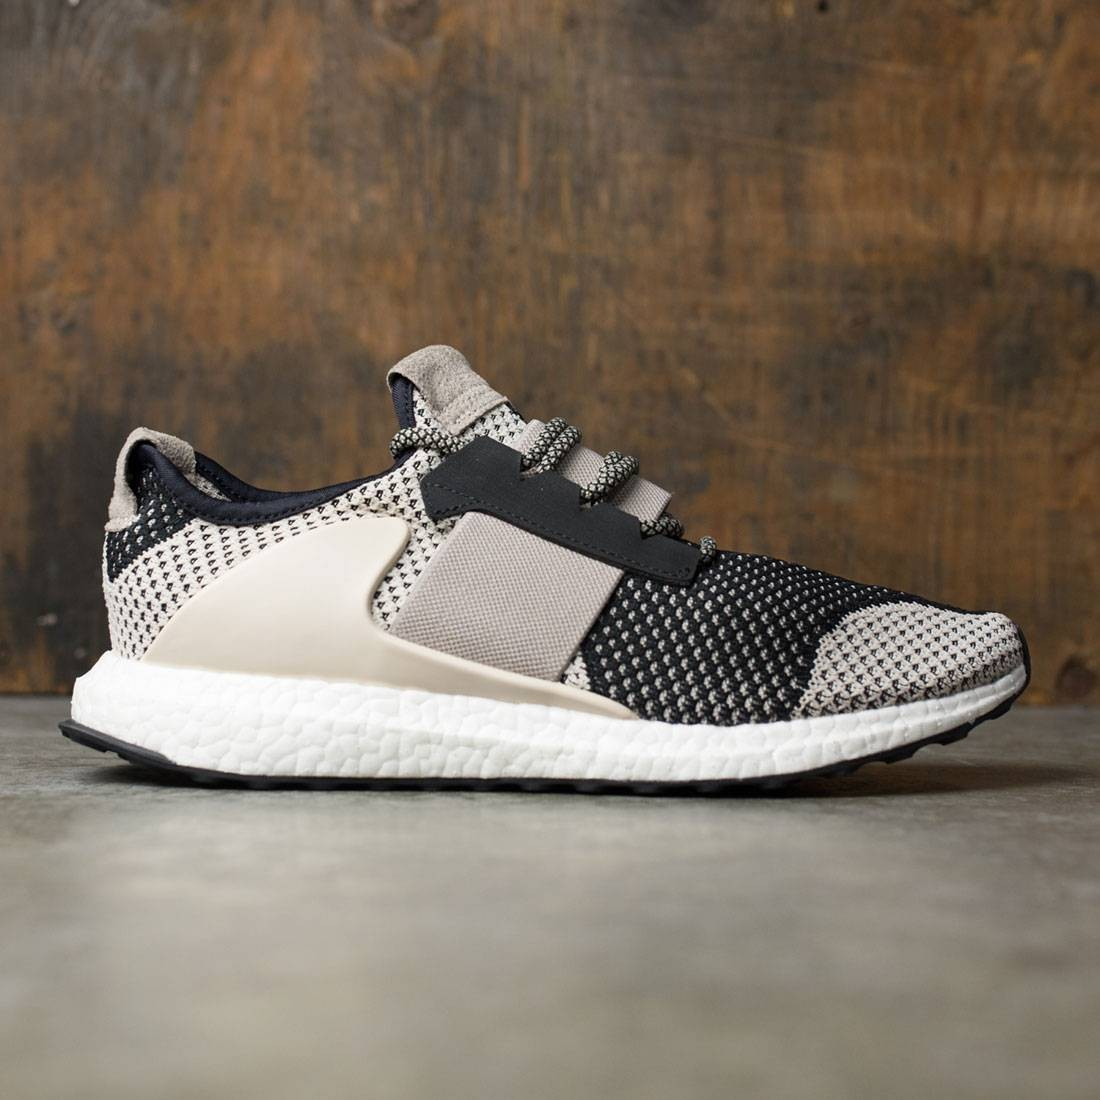 611fbc9cc0b6 ... Adidas Consortium Day One Men ADO UltraBoost ZG (brown clear brown  light brown black) Oem Factory Direct Online ...